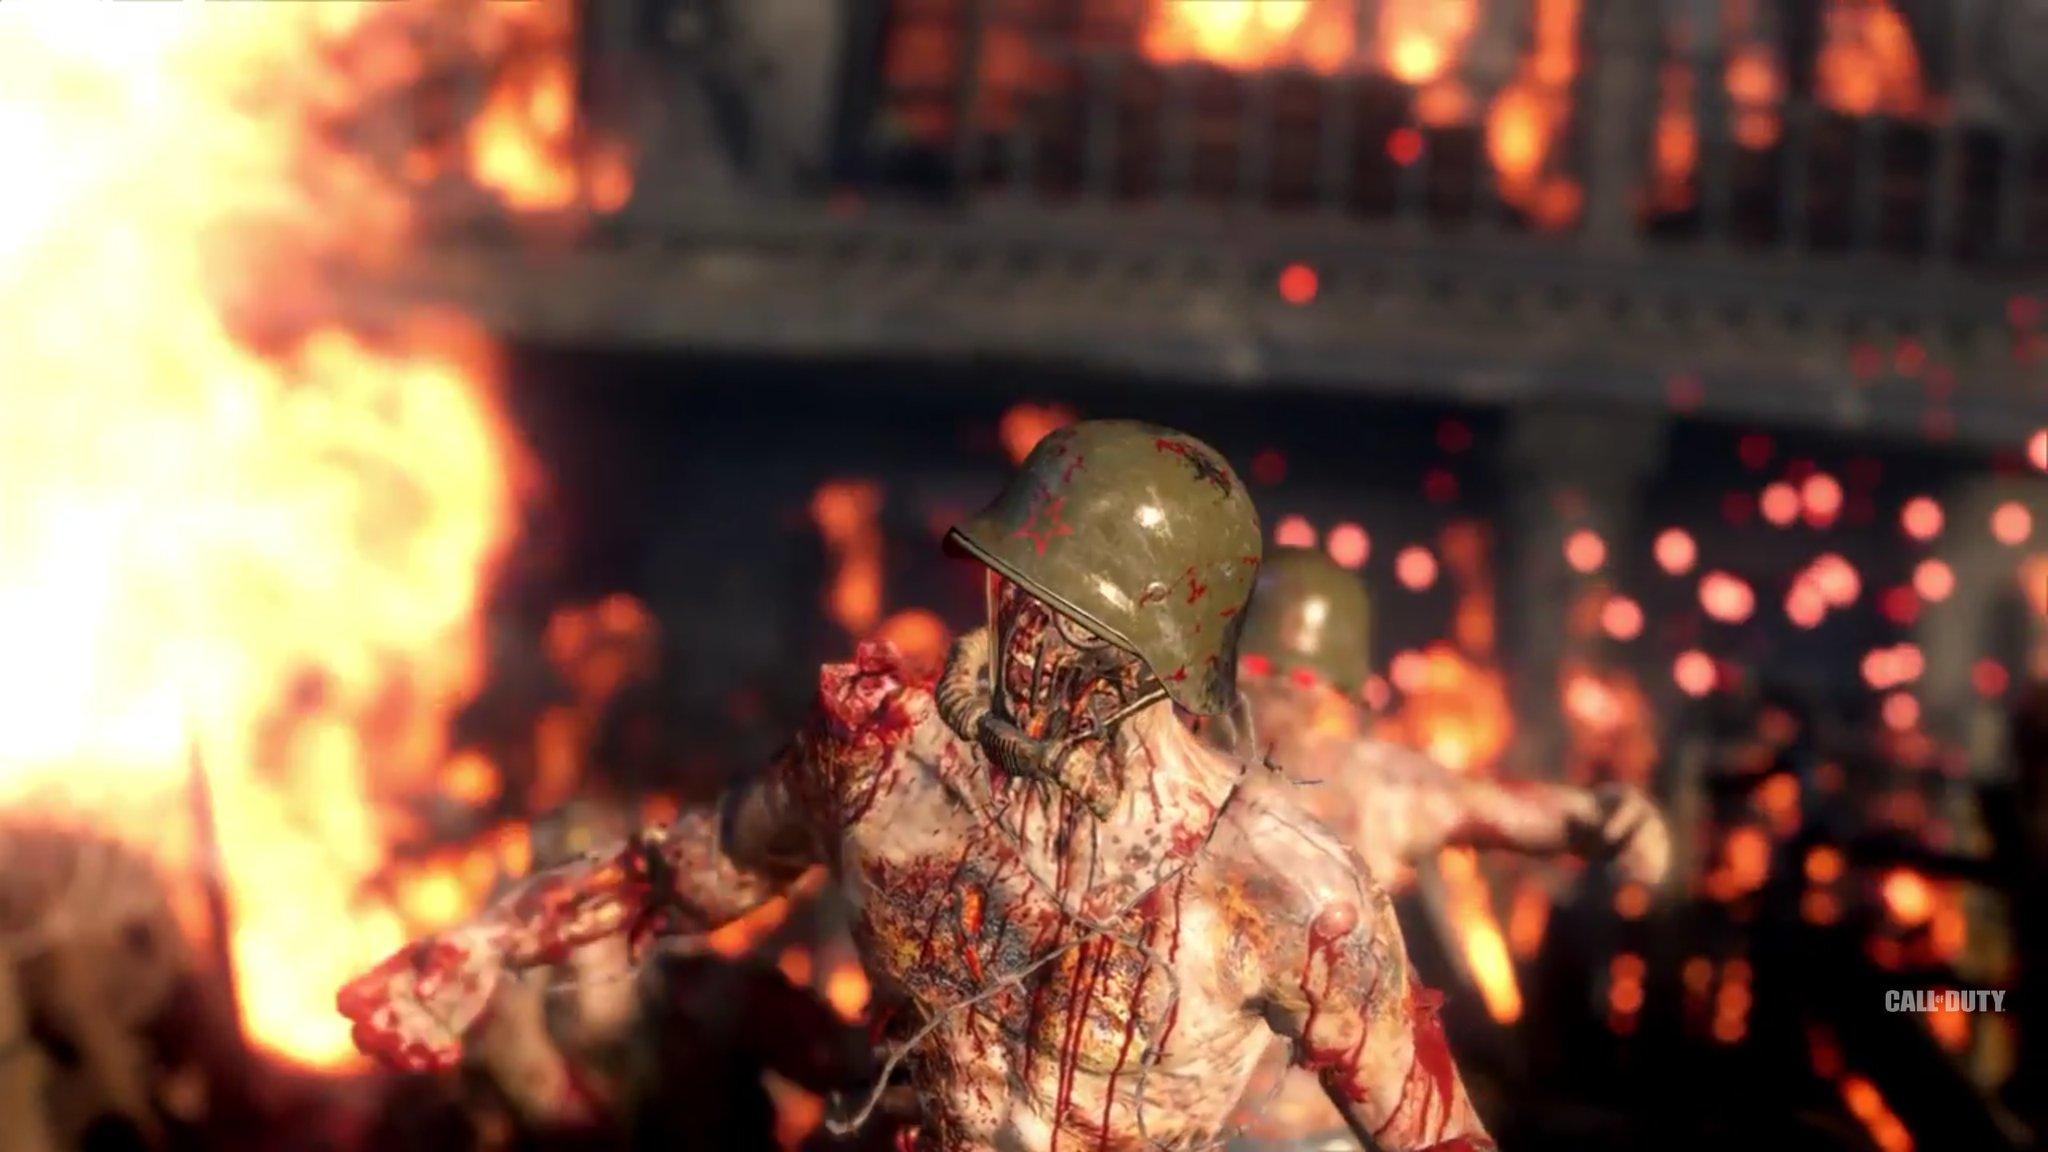 Call of Duty: Black Ops III DLC Descent